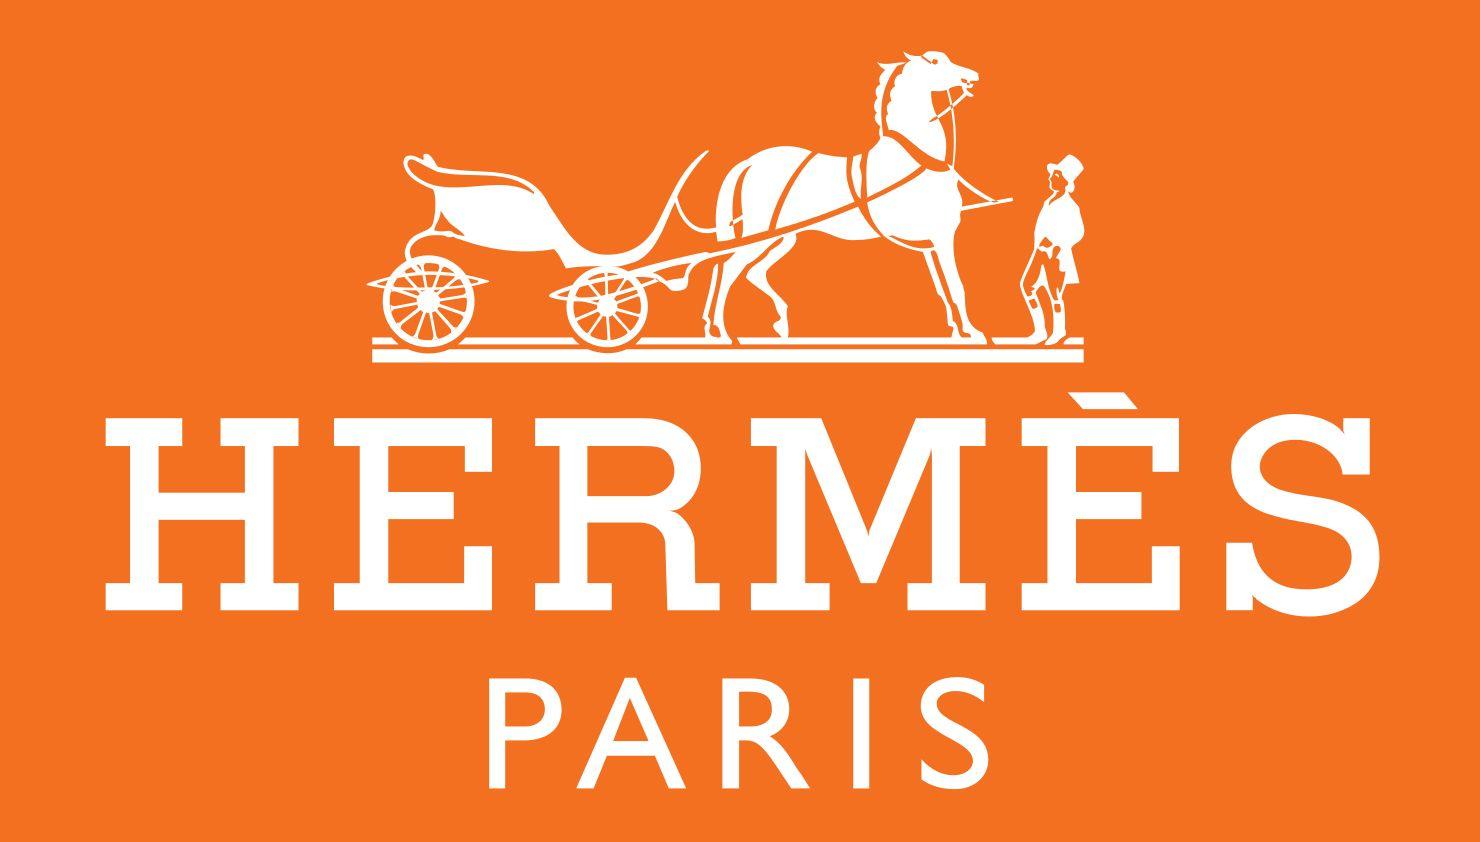 هيرمس Hermes